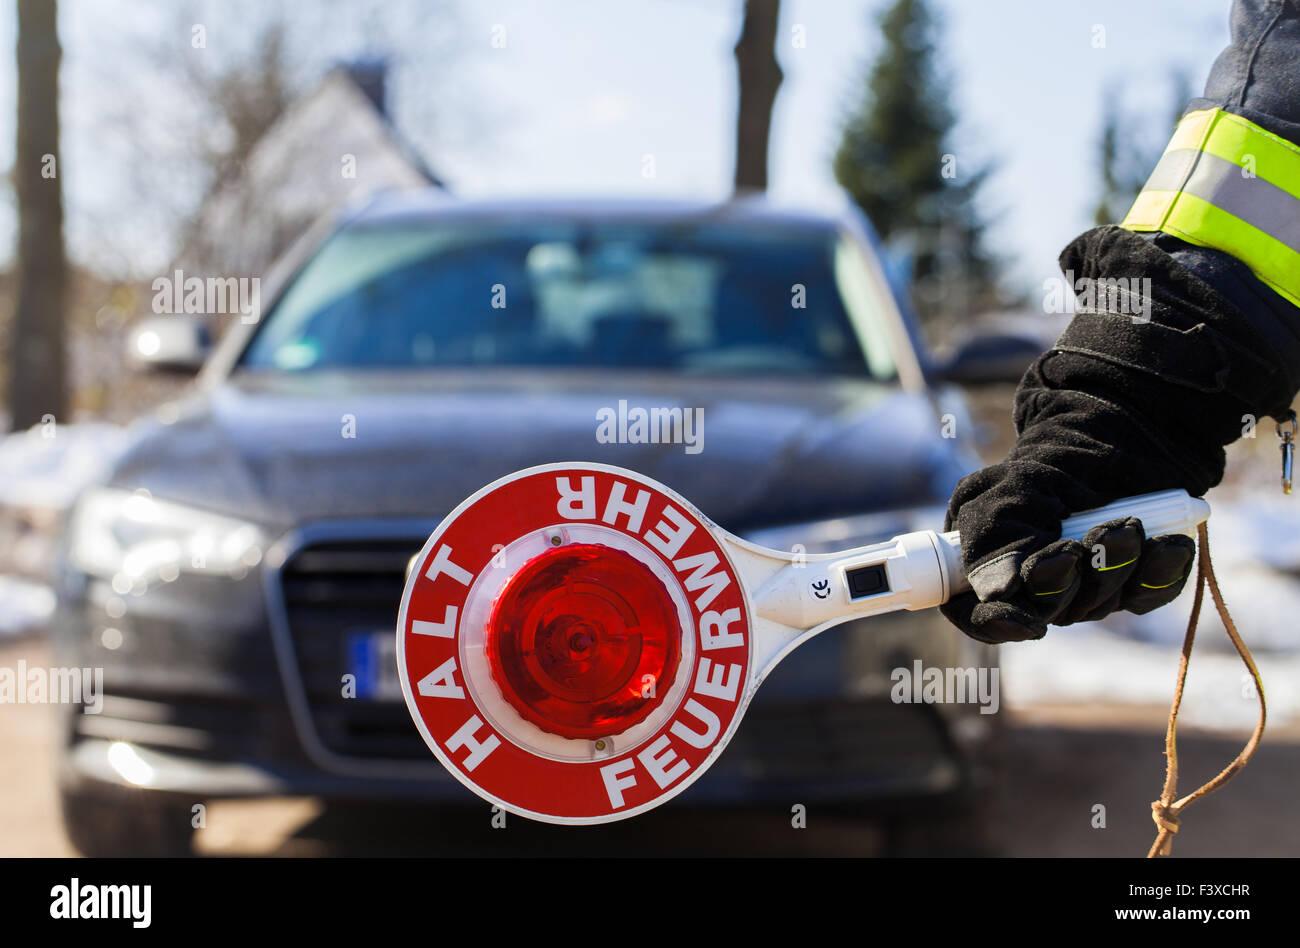 Firefighter fireman roadblock - Stock Image